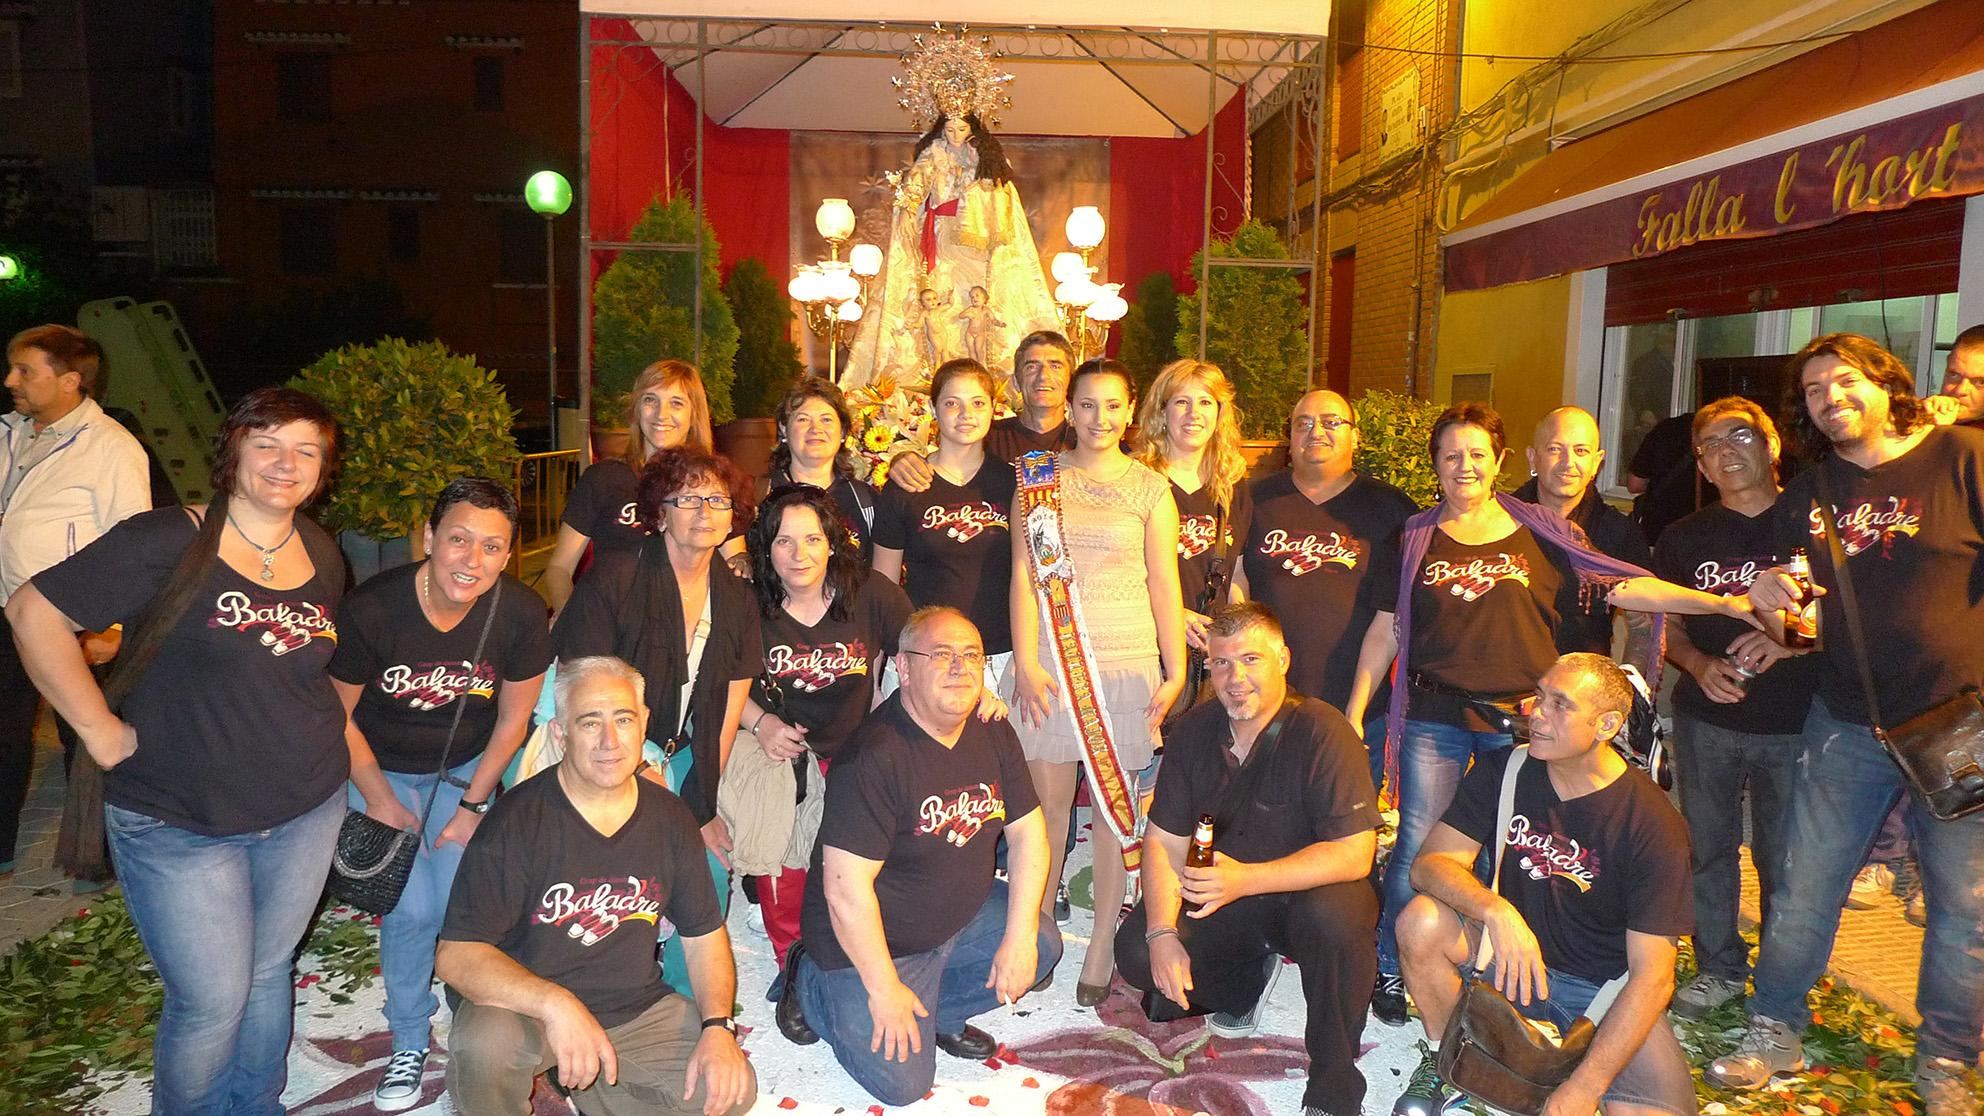 2014-06-07-Albaes d'Albal-Desemparats07 (8)